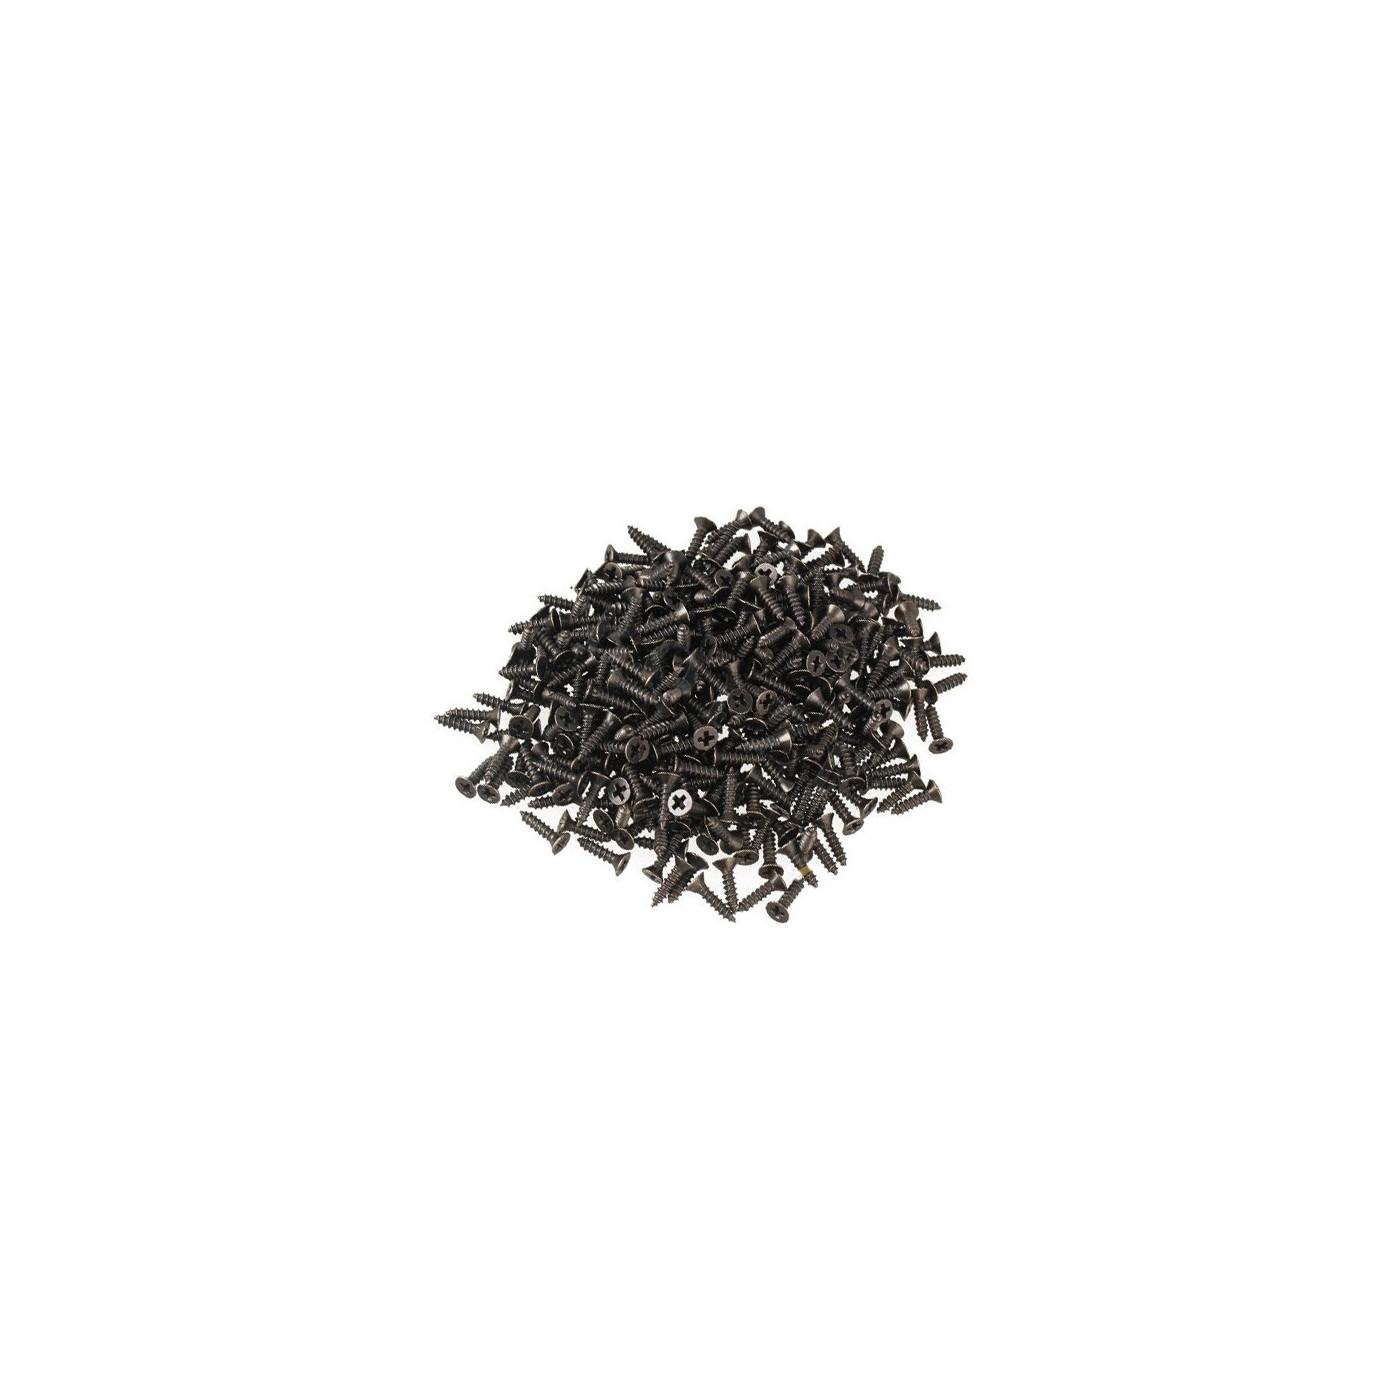 100 mini screws (2.5x8 mm, countersunk, bronze color)